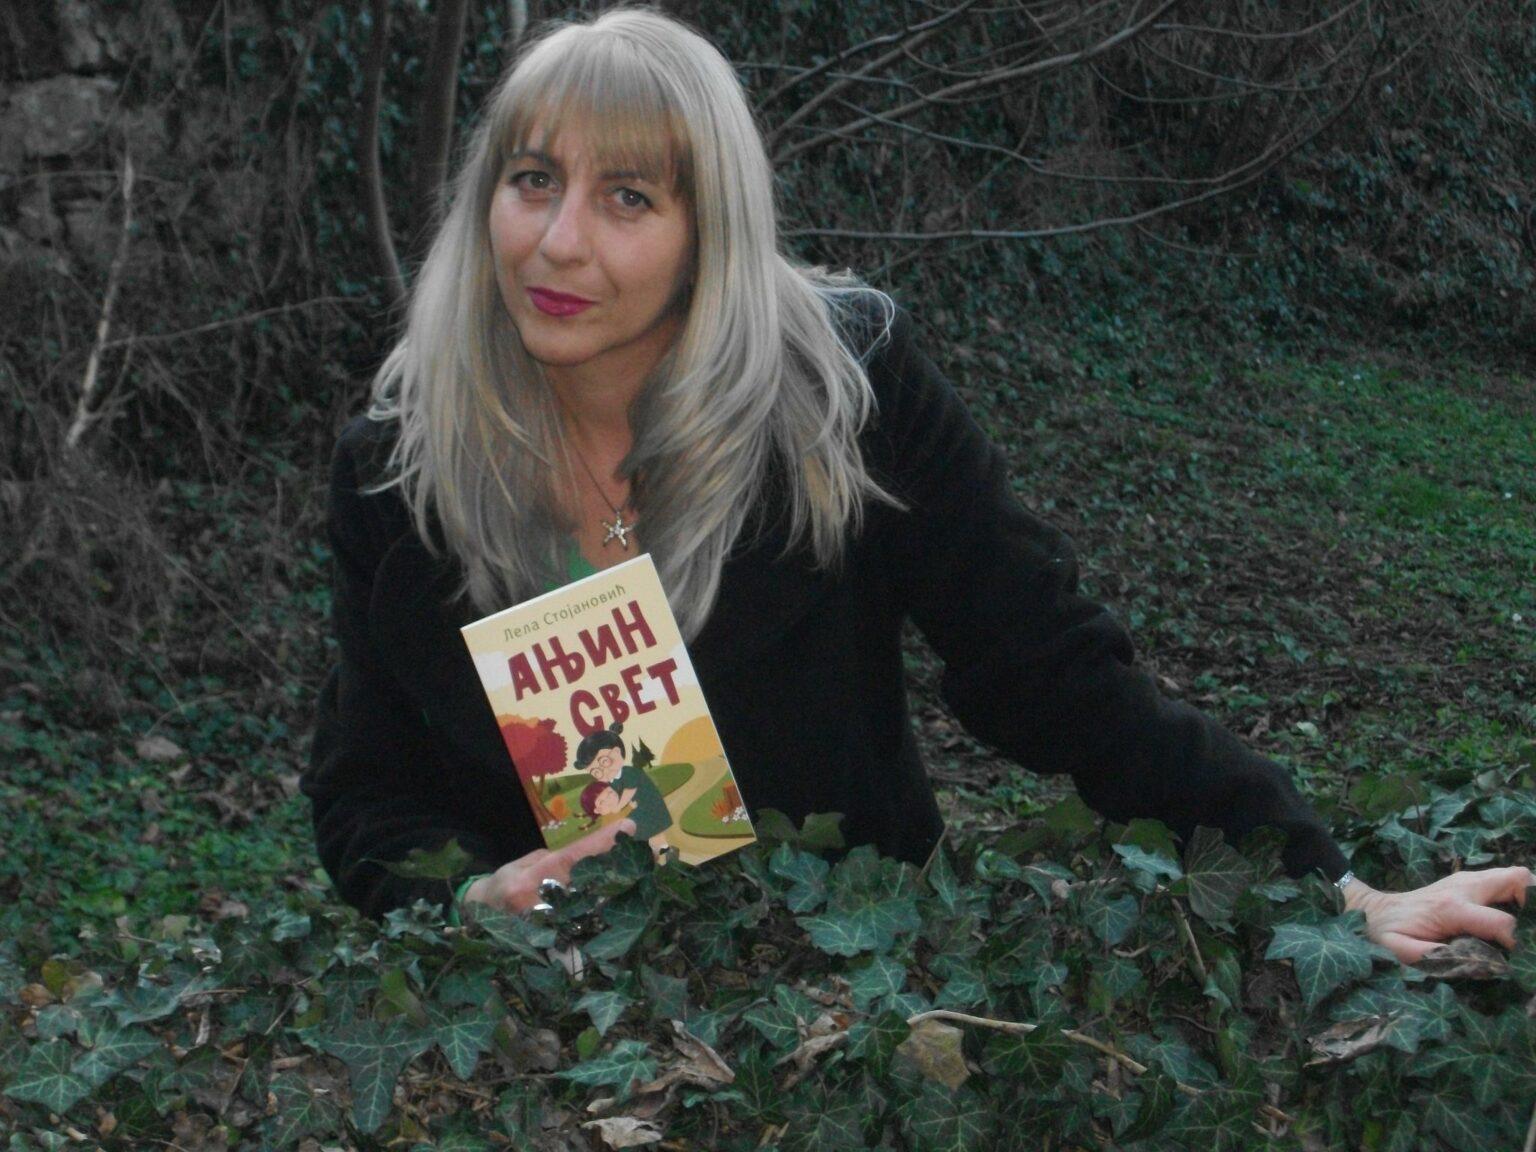 Anjin svet - knjiga za decu o prihvatanju sebe i drugih